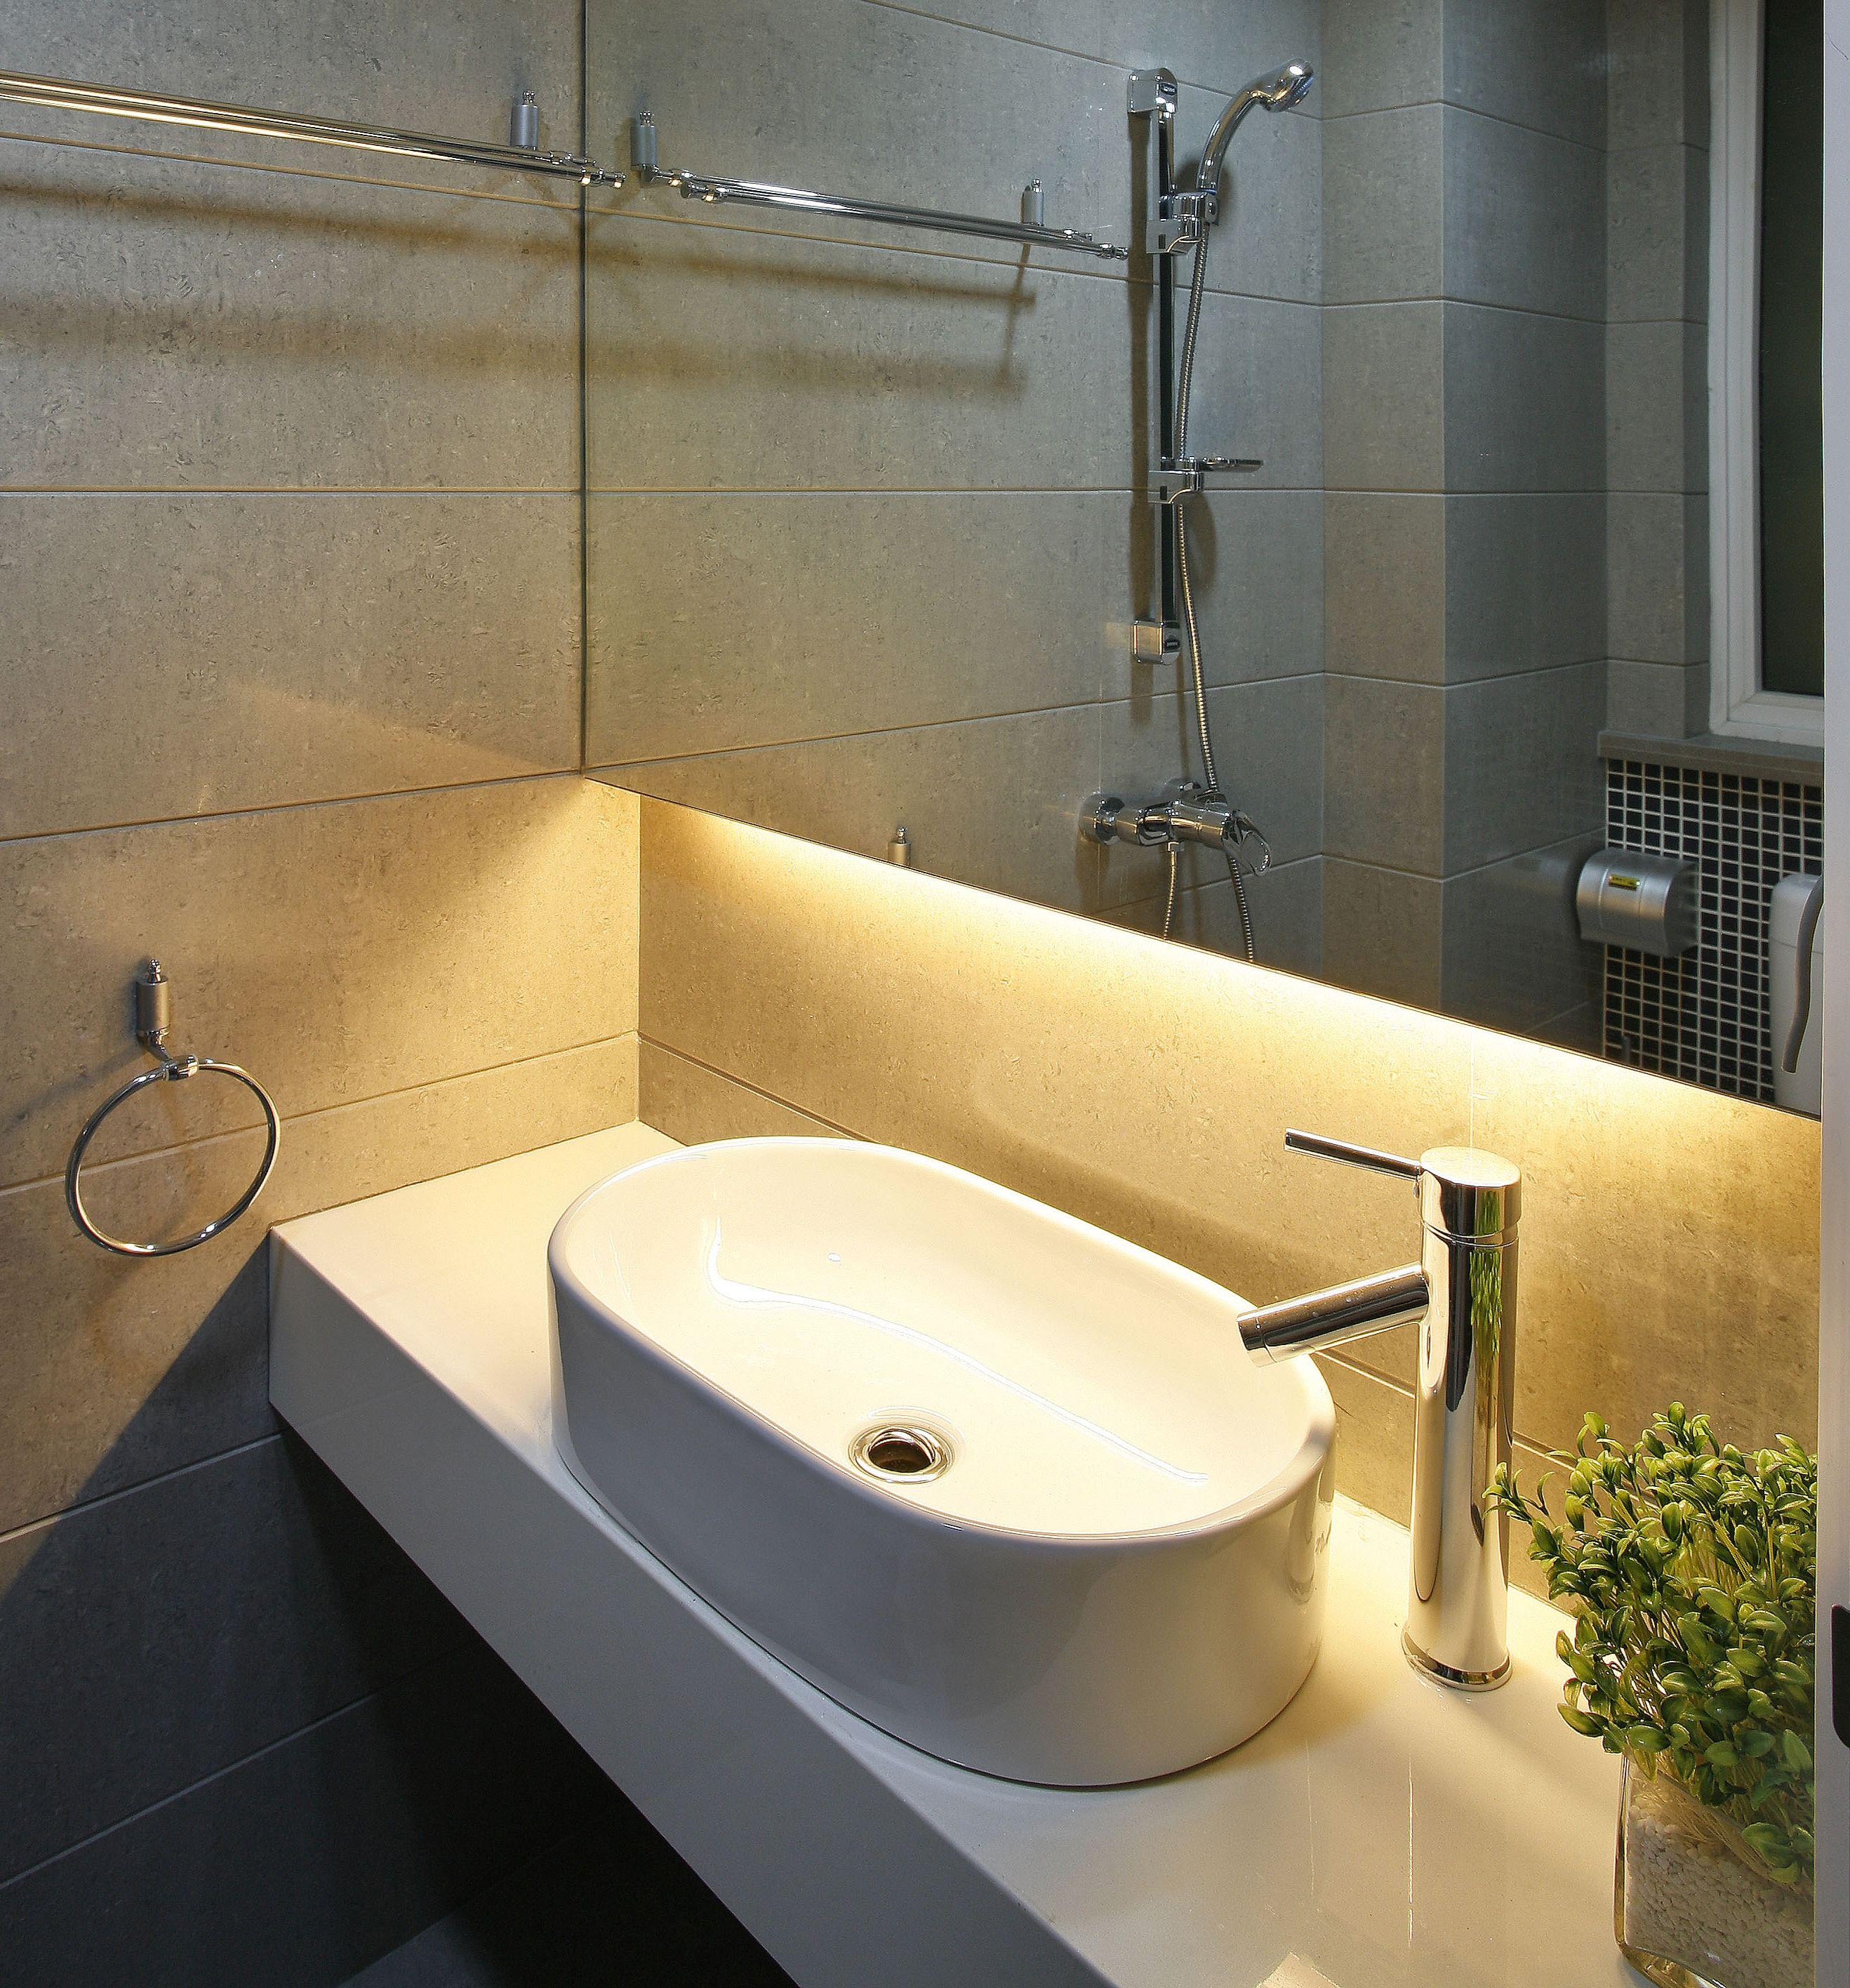 Pin By D M On Loo Led Bathroom Lights Led Tape Lighting Modern Bathroom Lighting